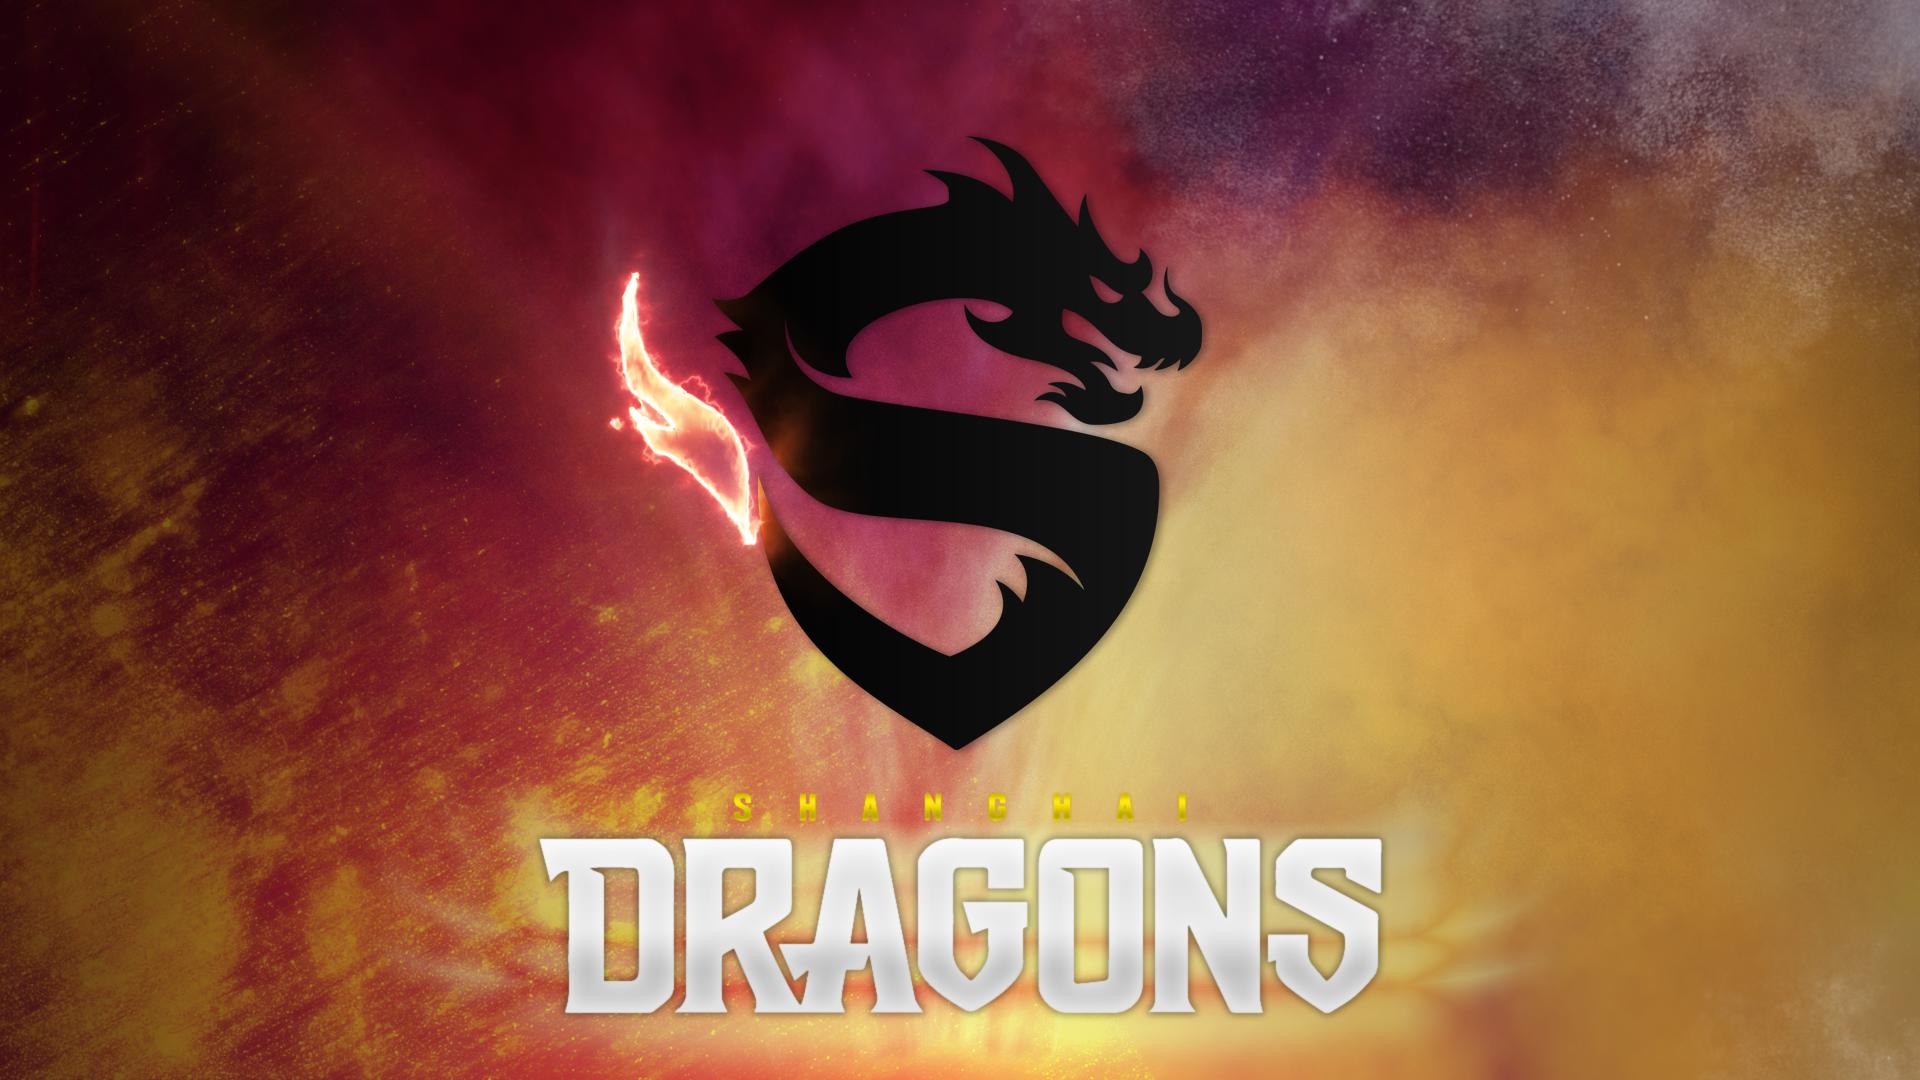 Wallpaper Overwatch League E Sports Shanghai Dragons 1920x1080